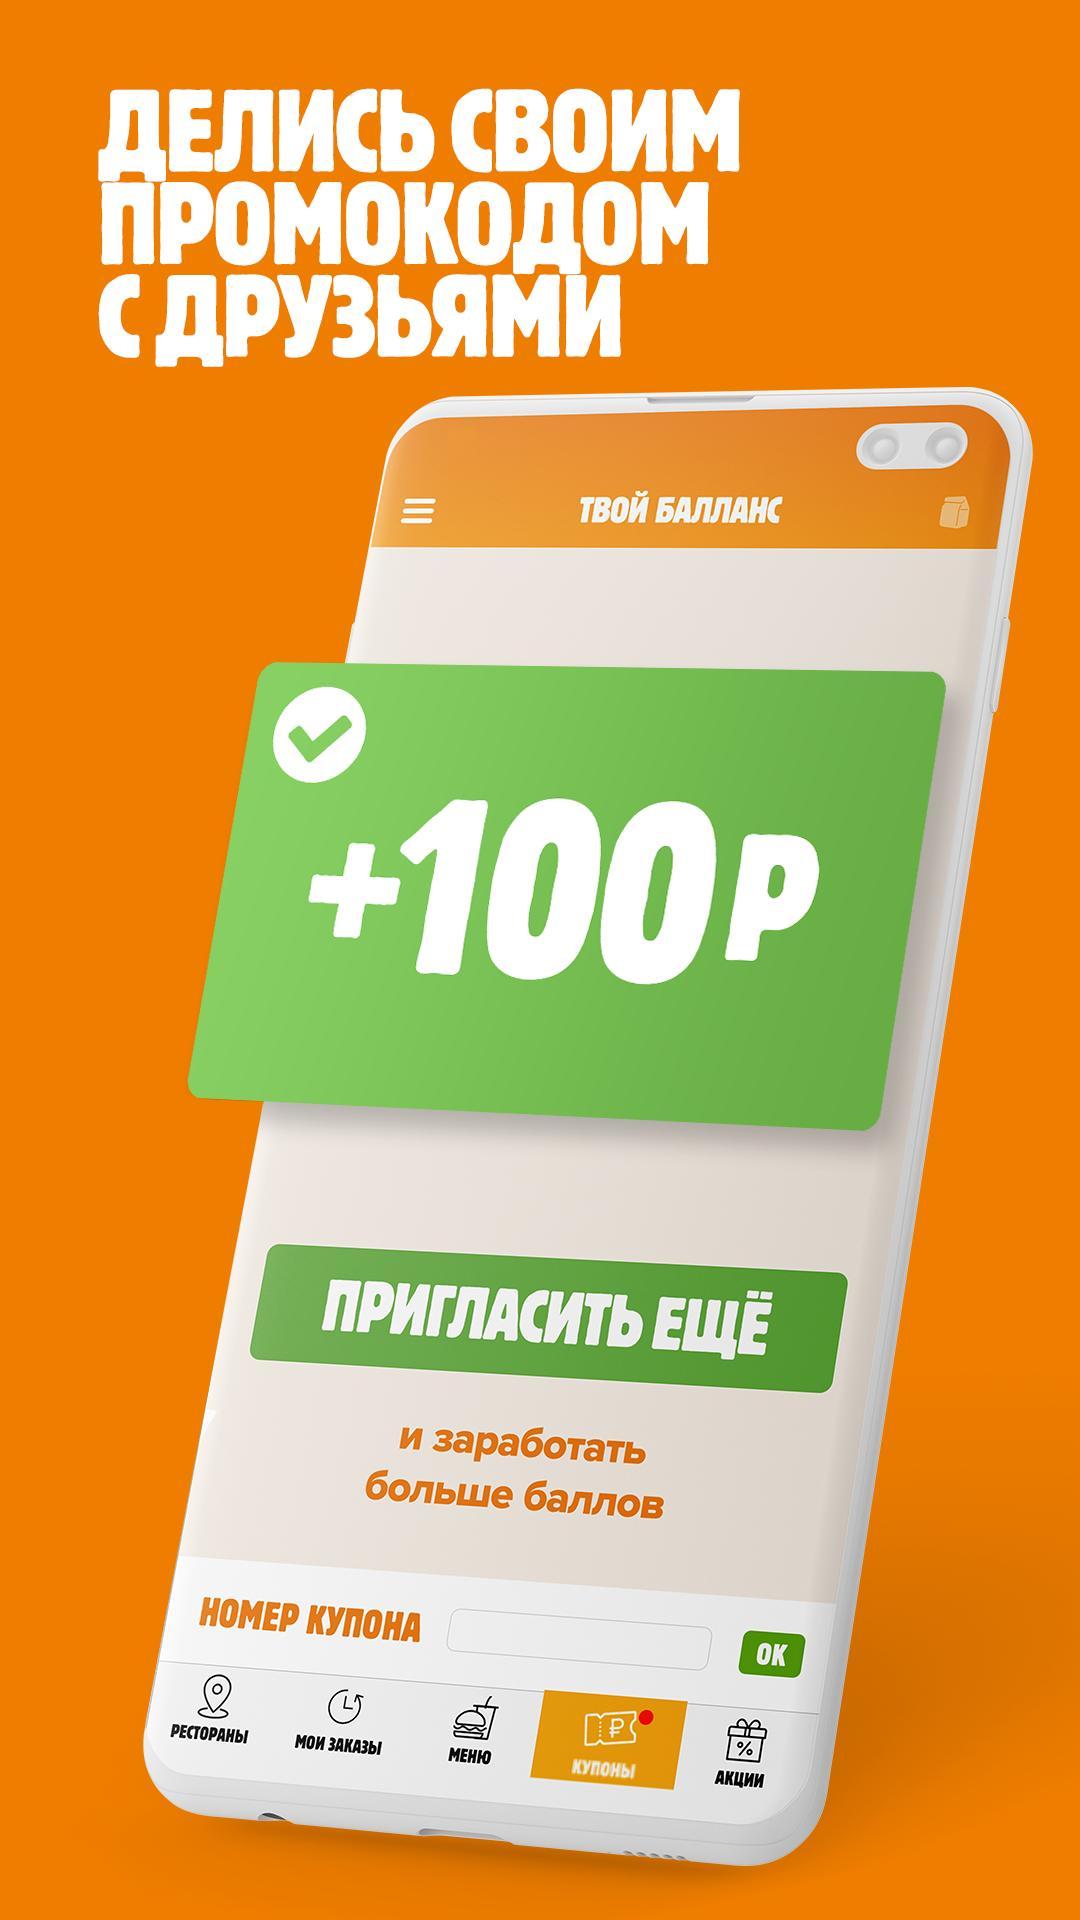 БУРГЕР КИНГ - 100 руб. за первый заказ 6.0.3 Screenshot 6